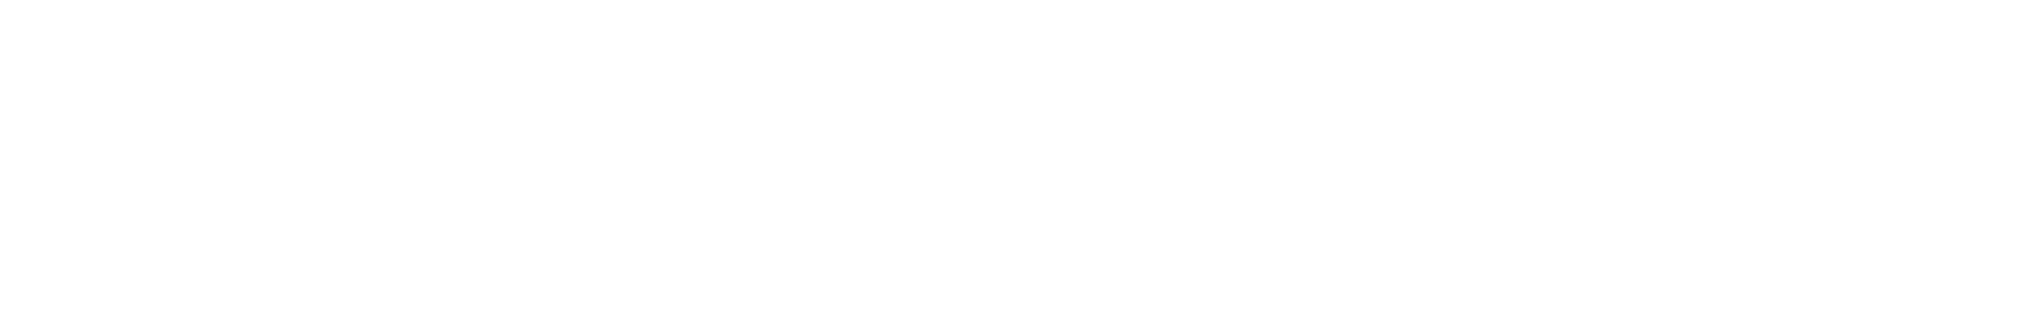 BISHOP'S BAR & BISTRO